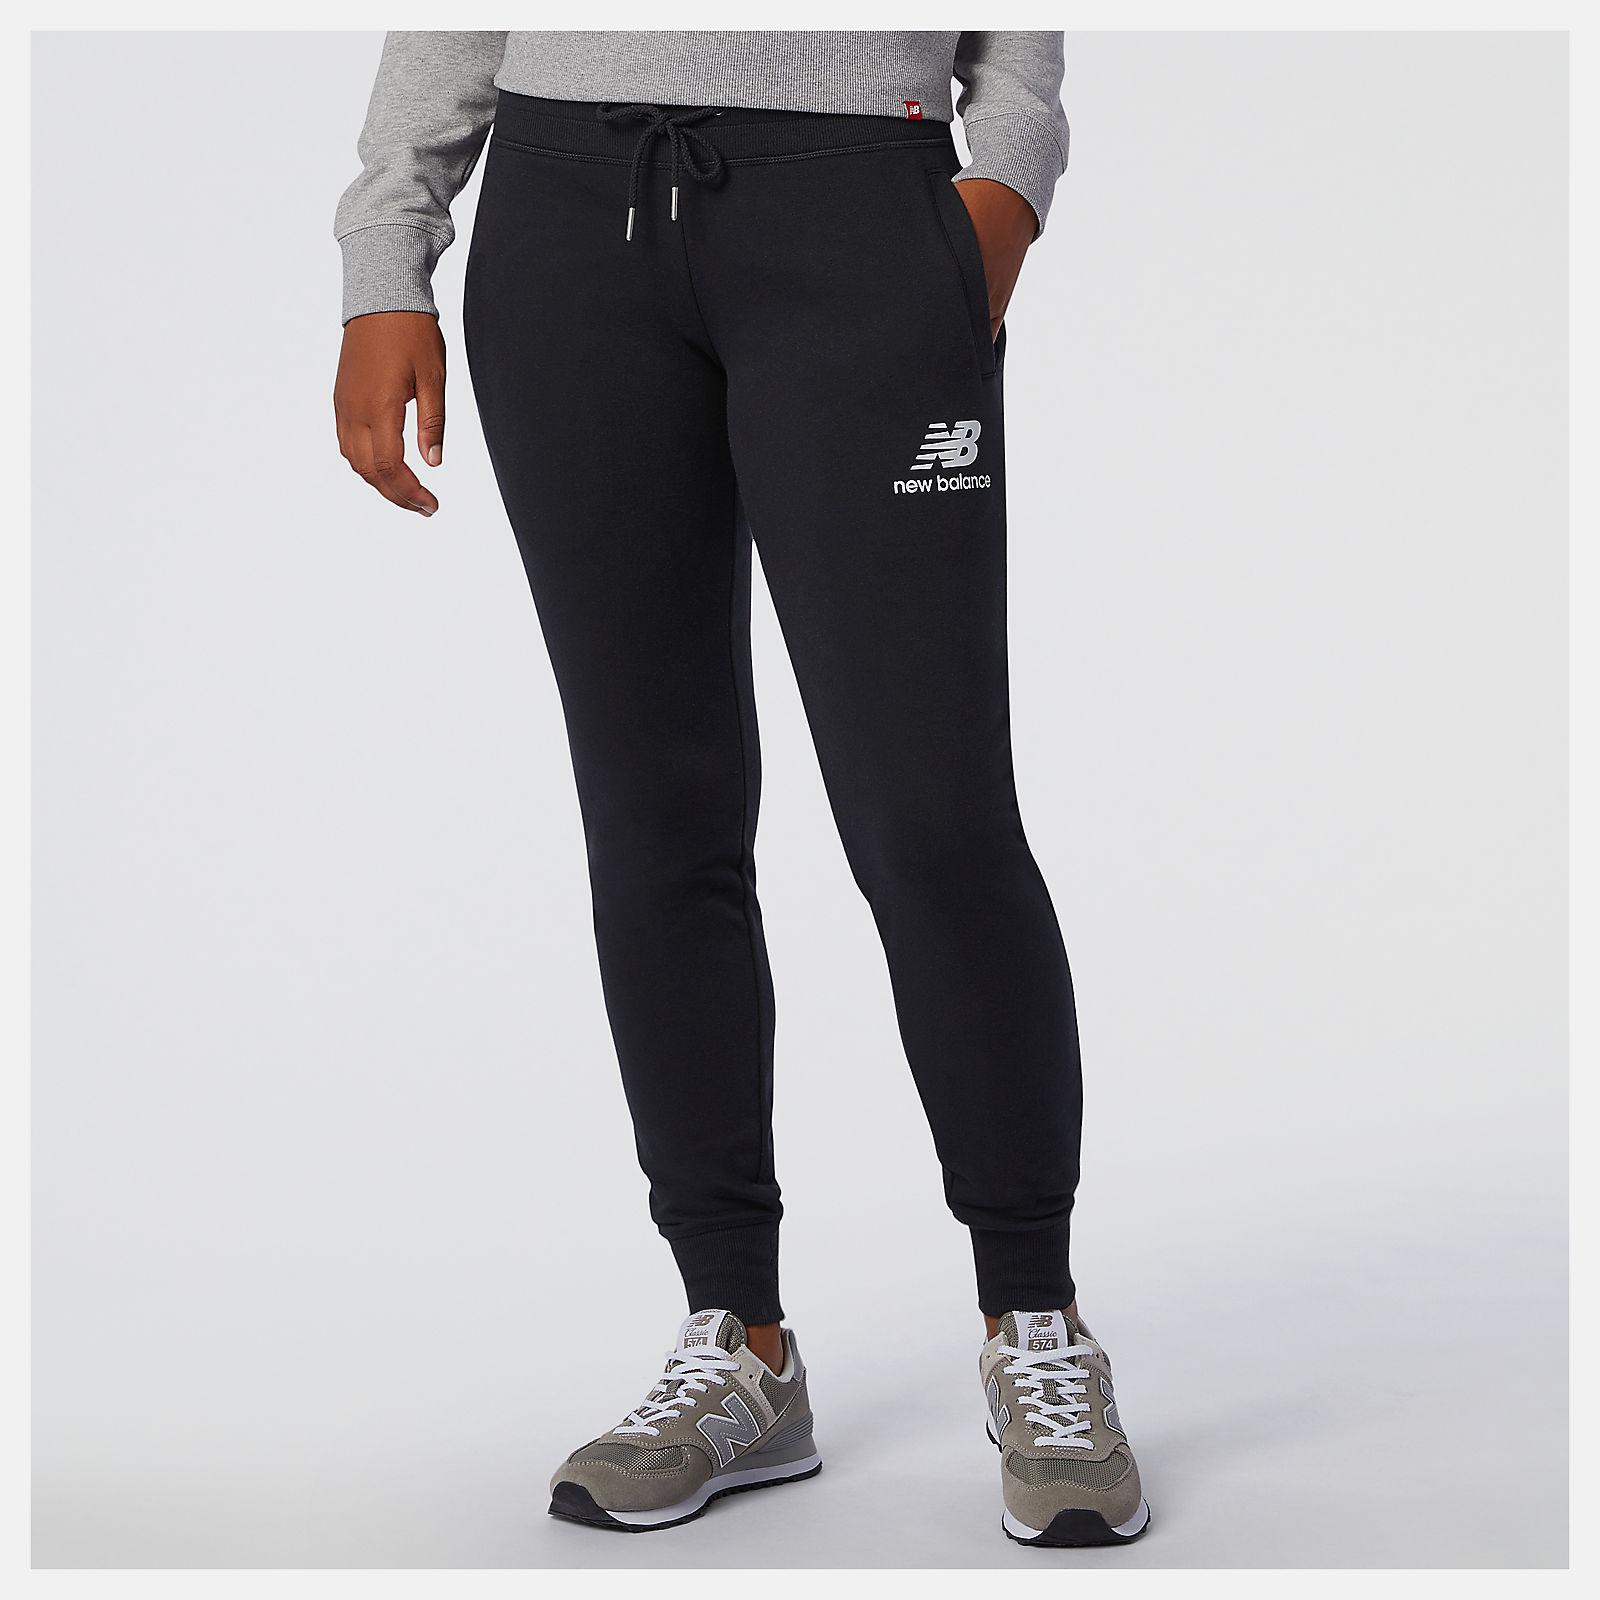 new balance sweatpants